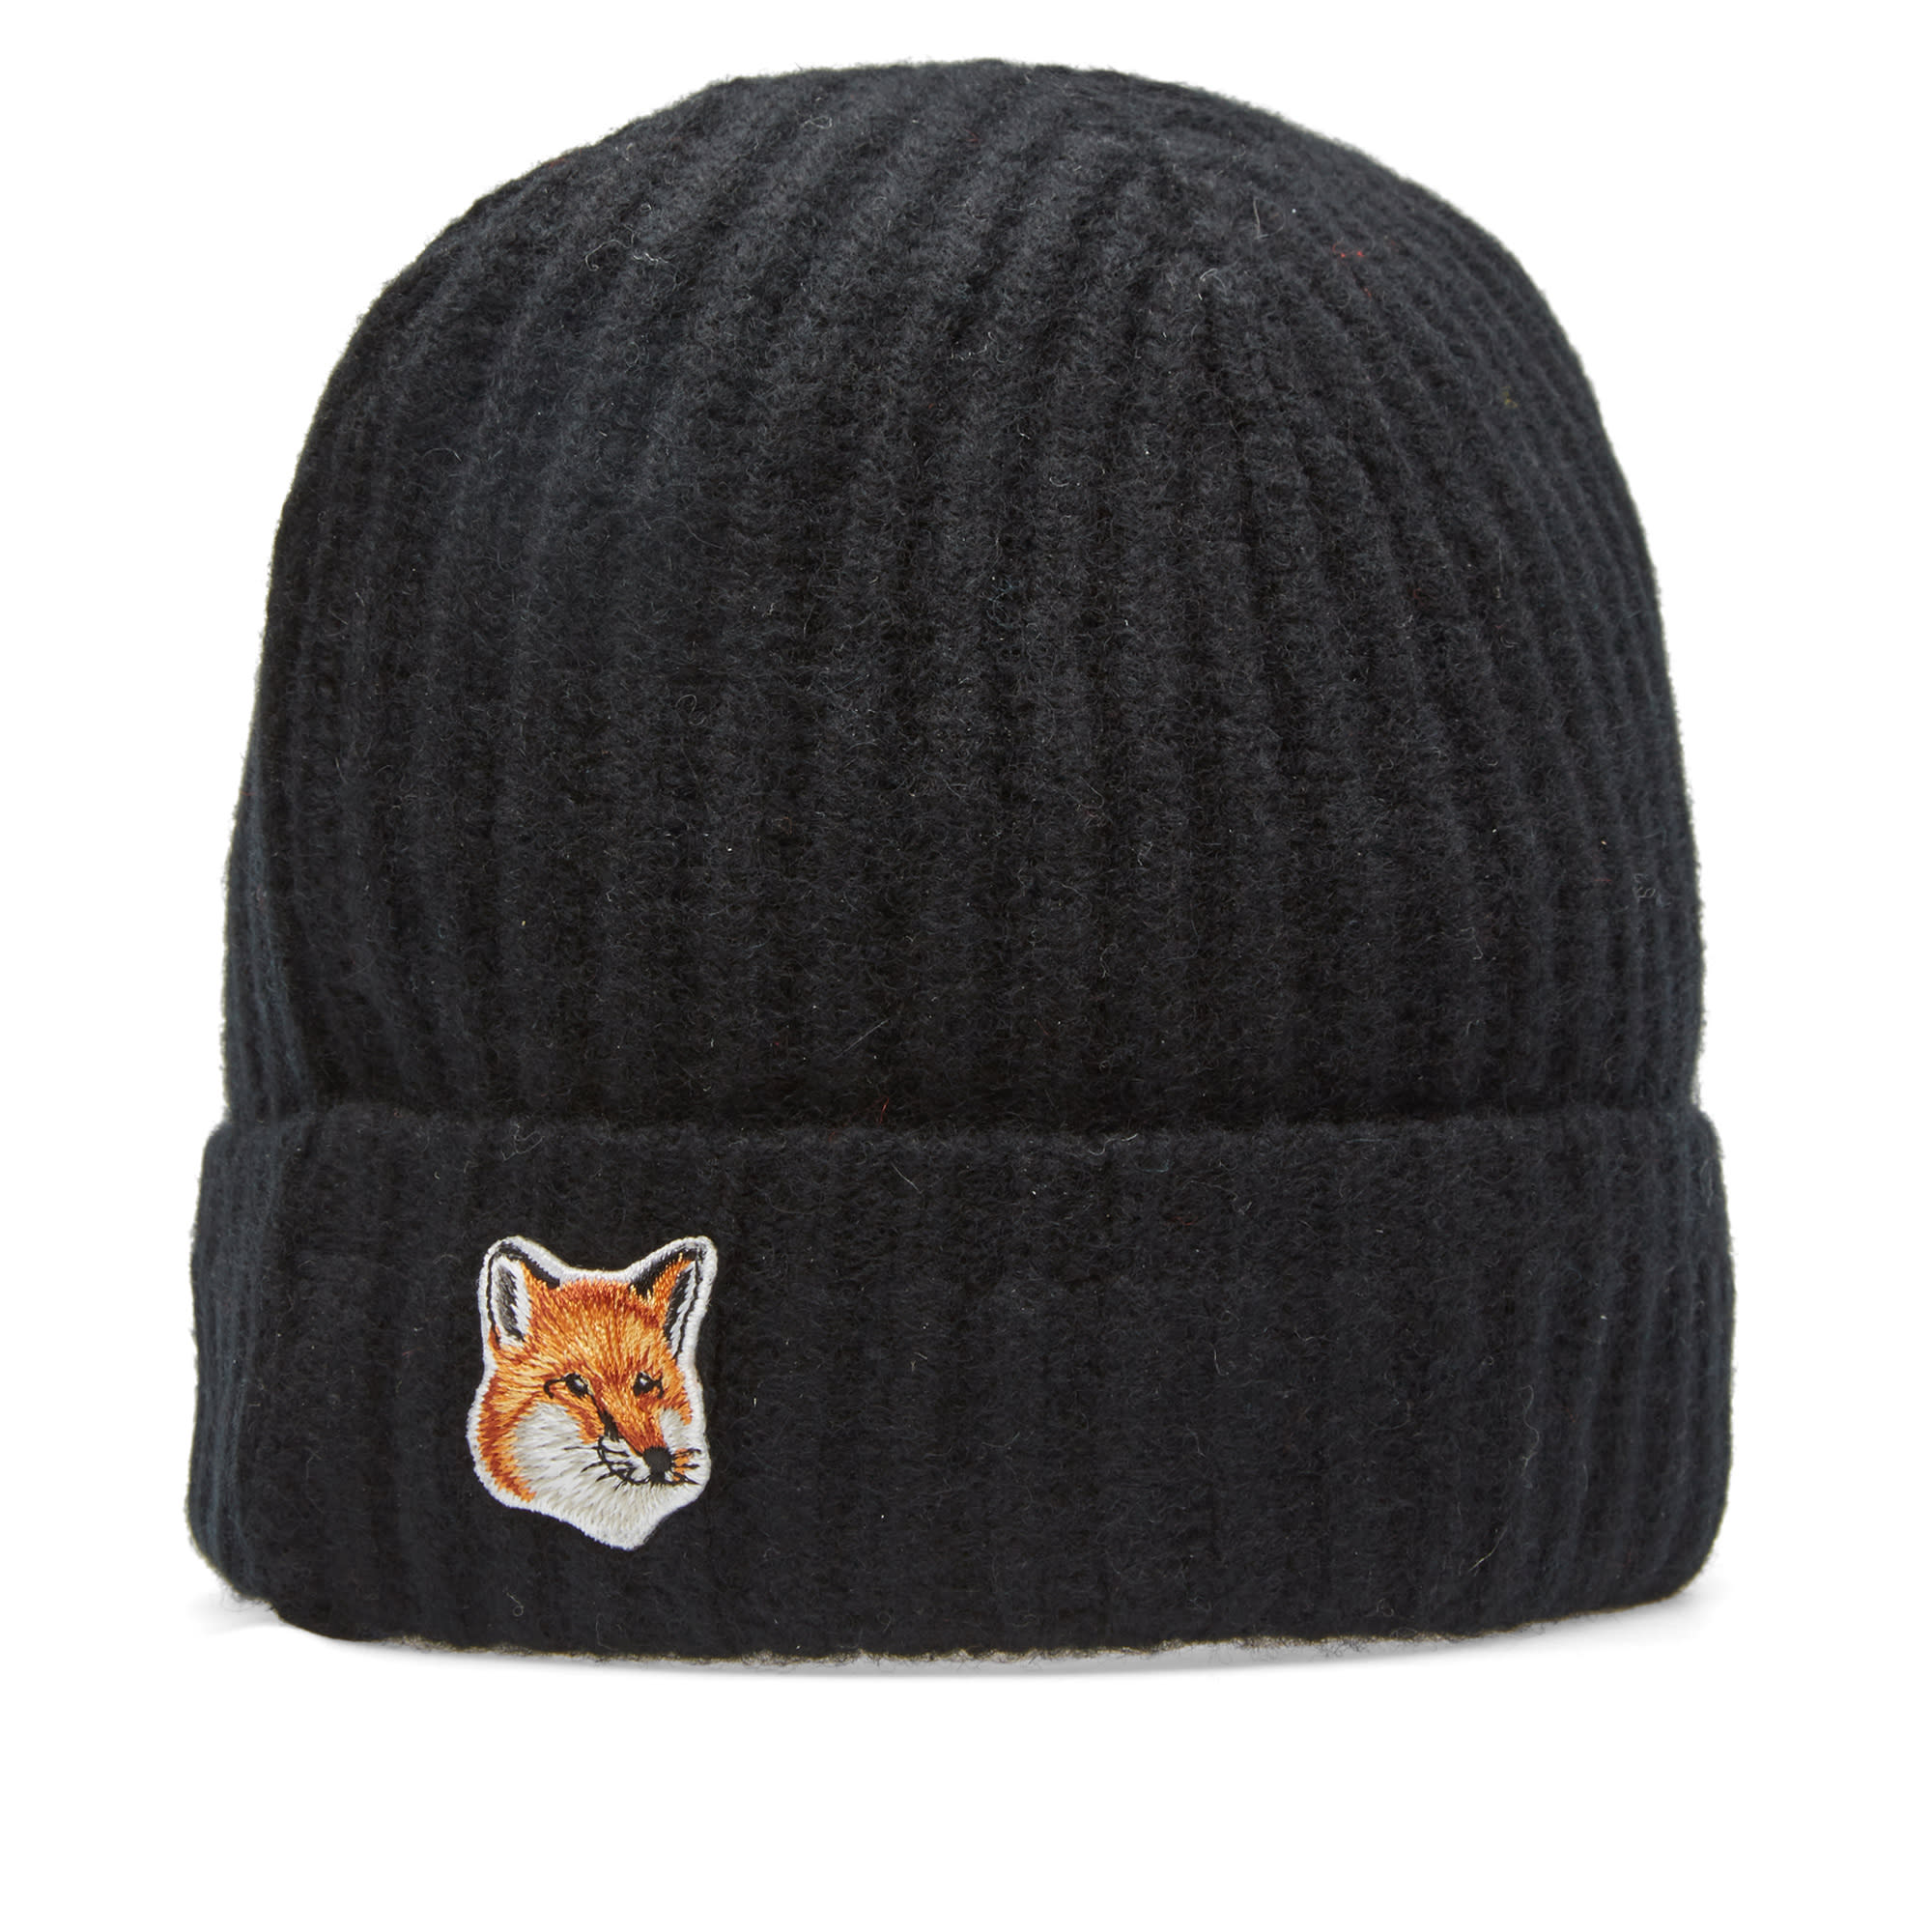 eaa1e231450b9 Maison Kitsuné Fox Beanie Black